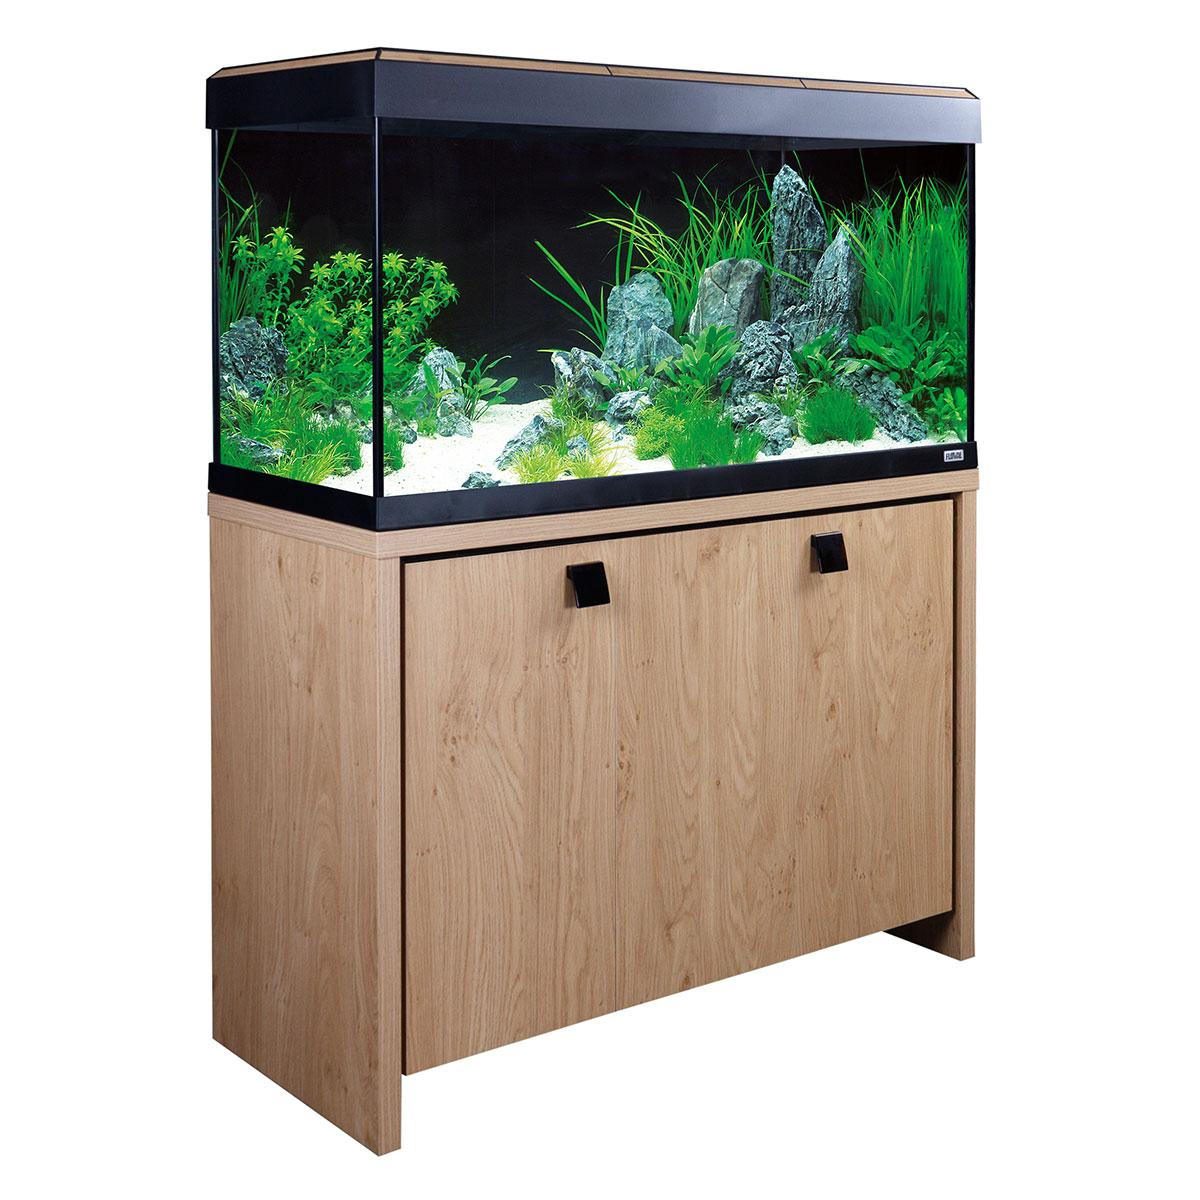 fluval aquarium roma 200 kombination g nstig kaufen bei zooroyal. Black Bedroom Furniture Sets. Home Design Ideas